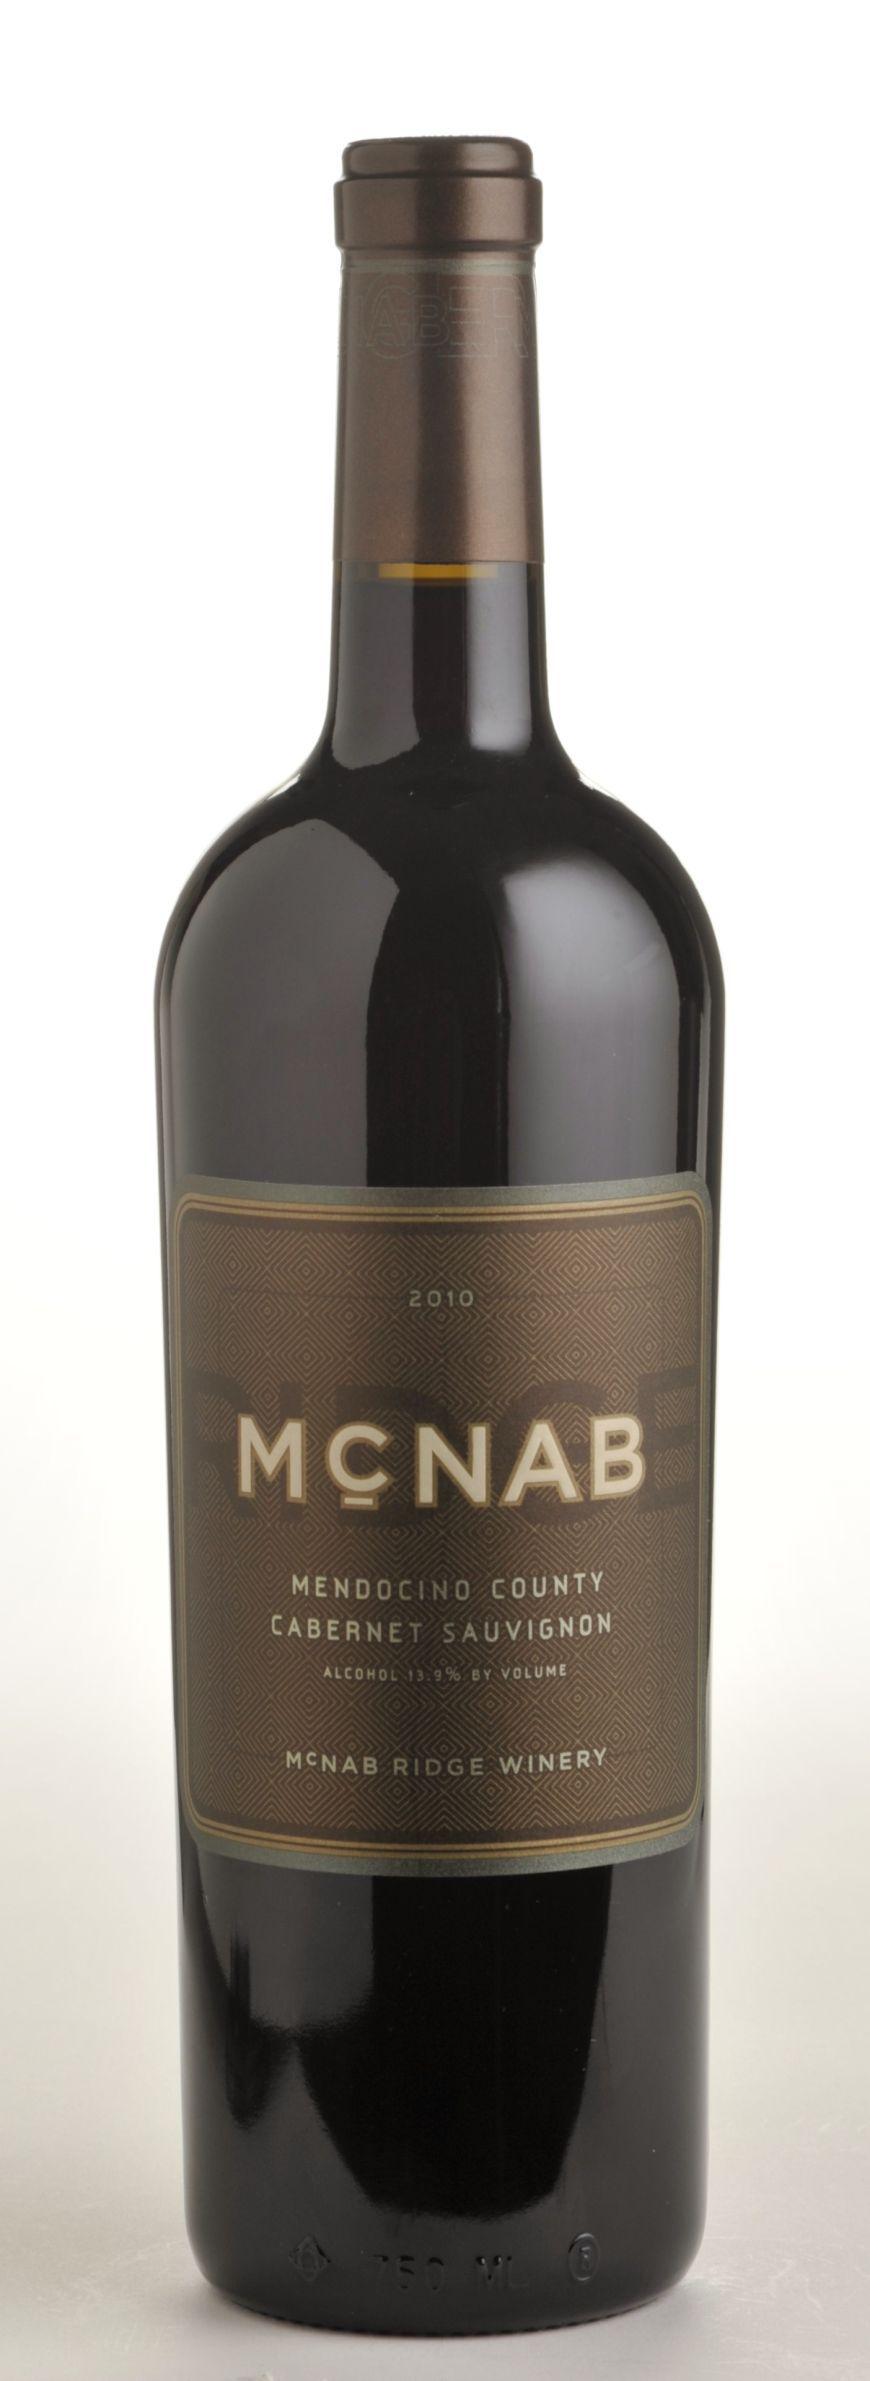 2014 McNab Ridge Winery Cabernet.jpg